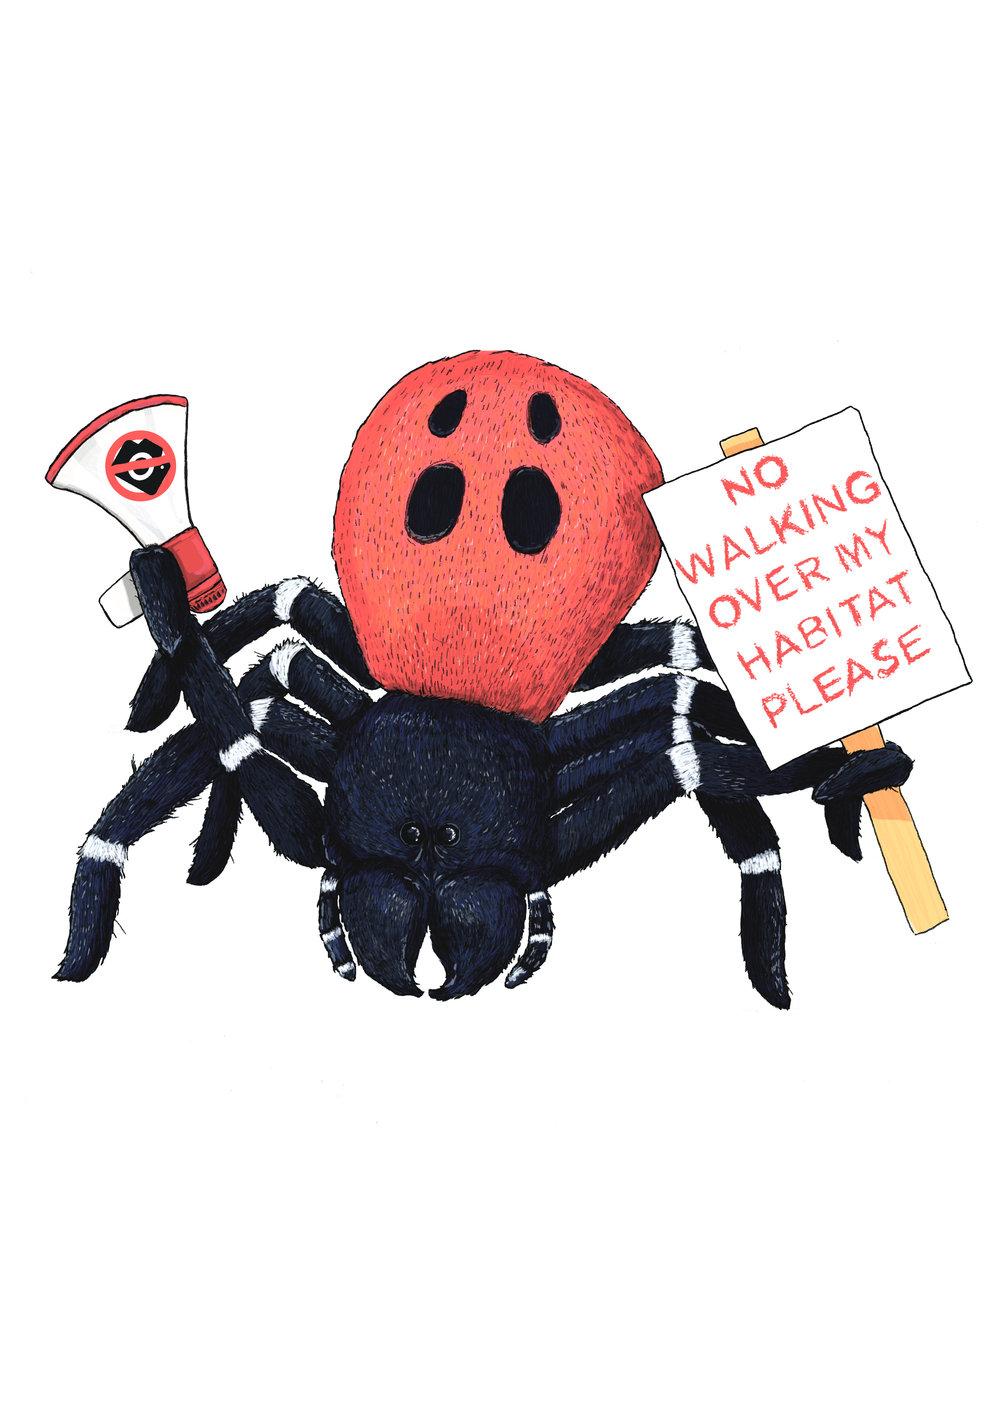 ladybird spiderfinal 3.jpg